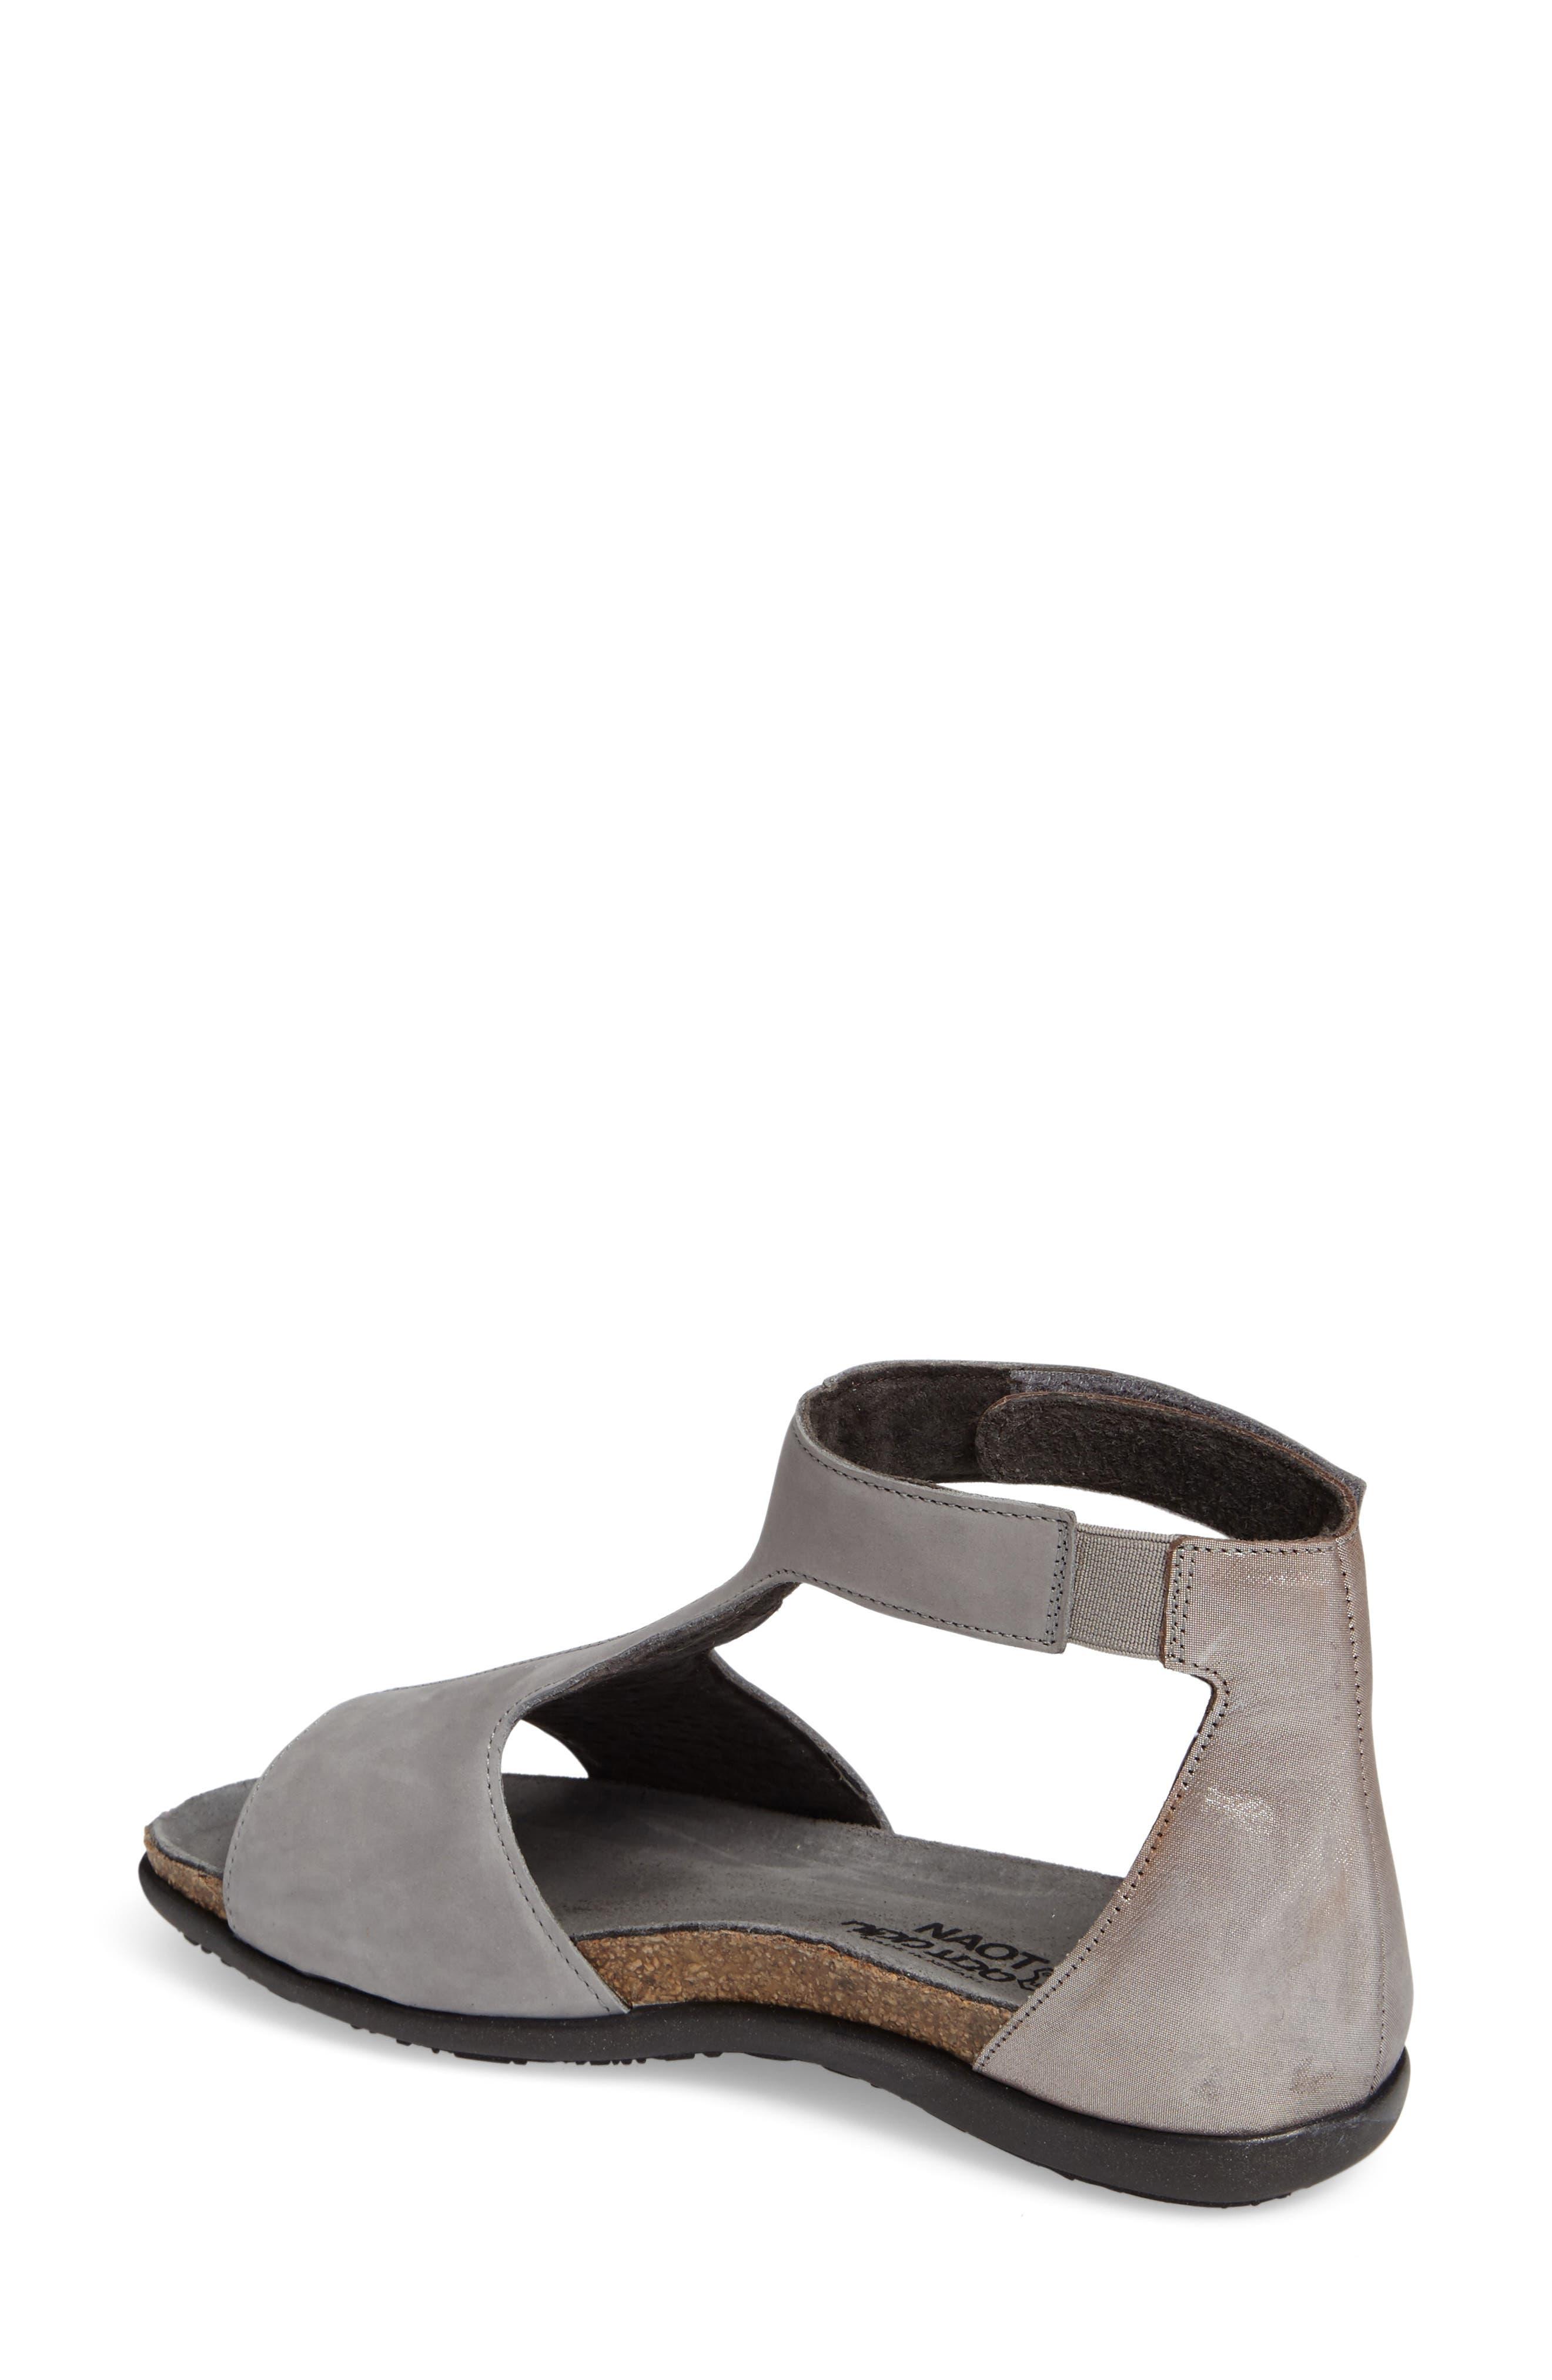 Nala Sandal,                             Alternate thumbnail 2, color,                             Grey/ Silver Nubuck Leather